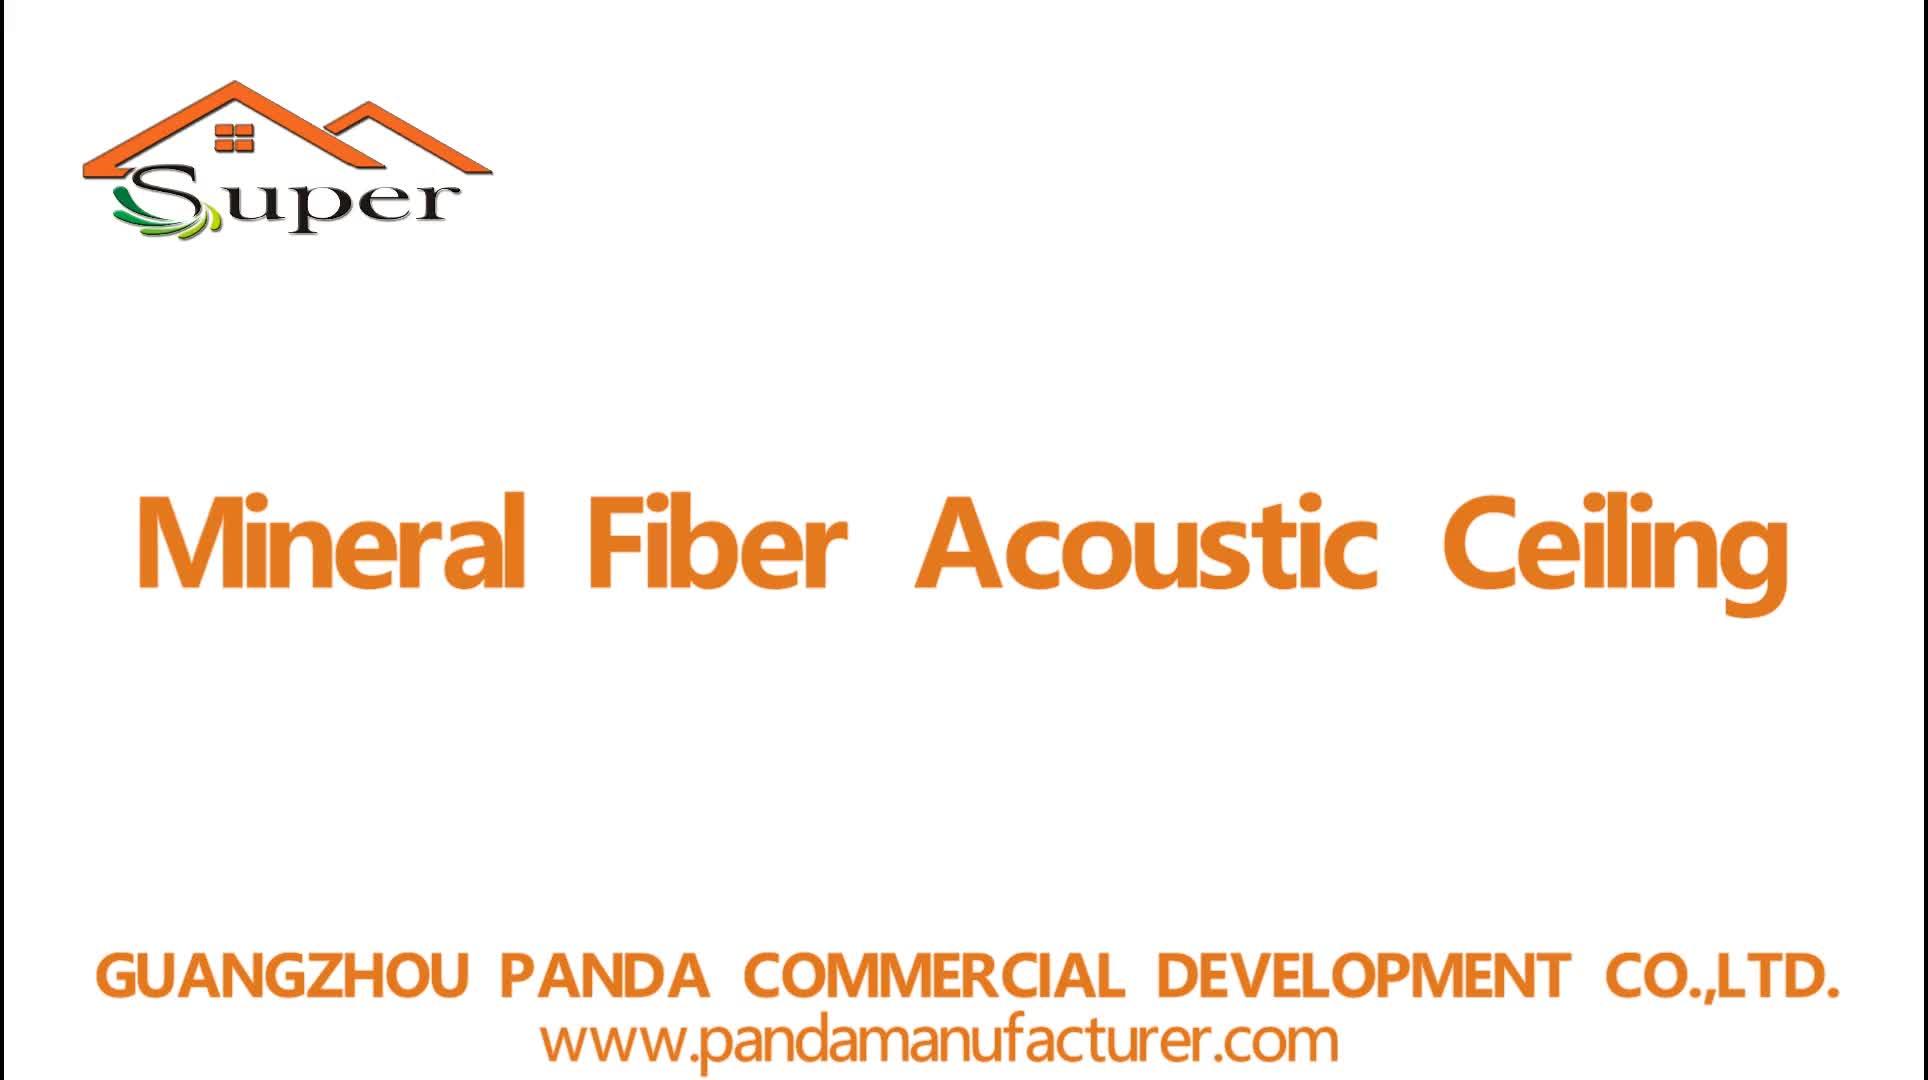 White Sound Acoustic Square Mineral Fiber Ceiling False Ceilings